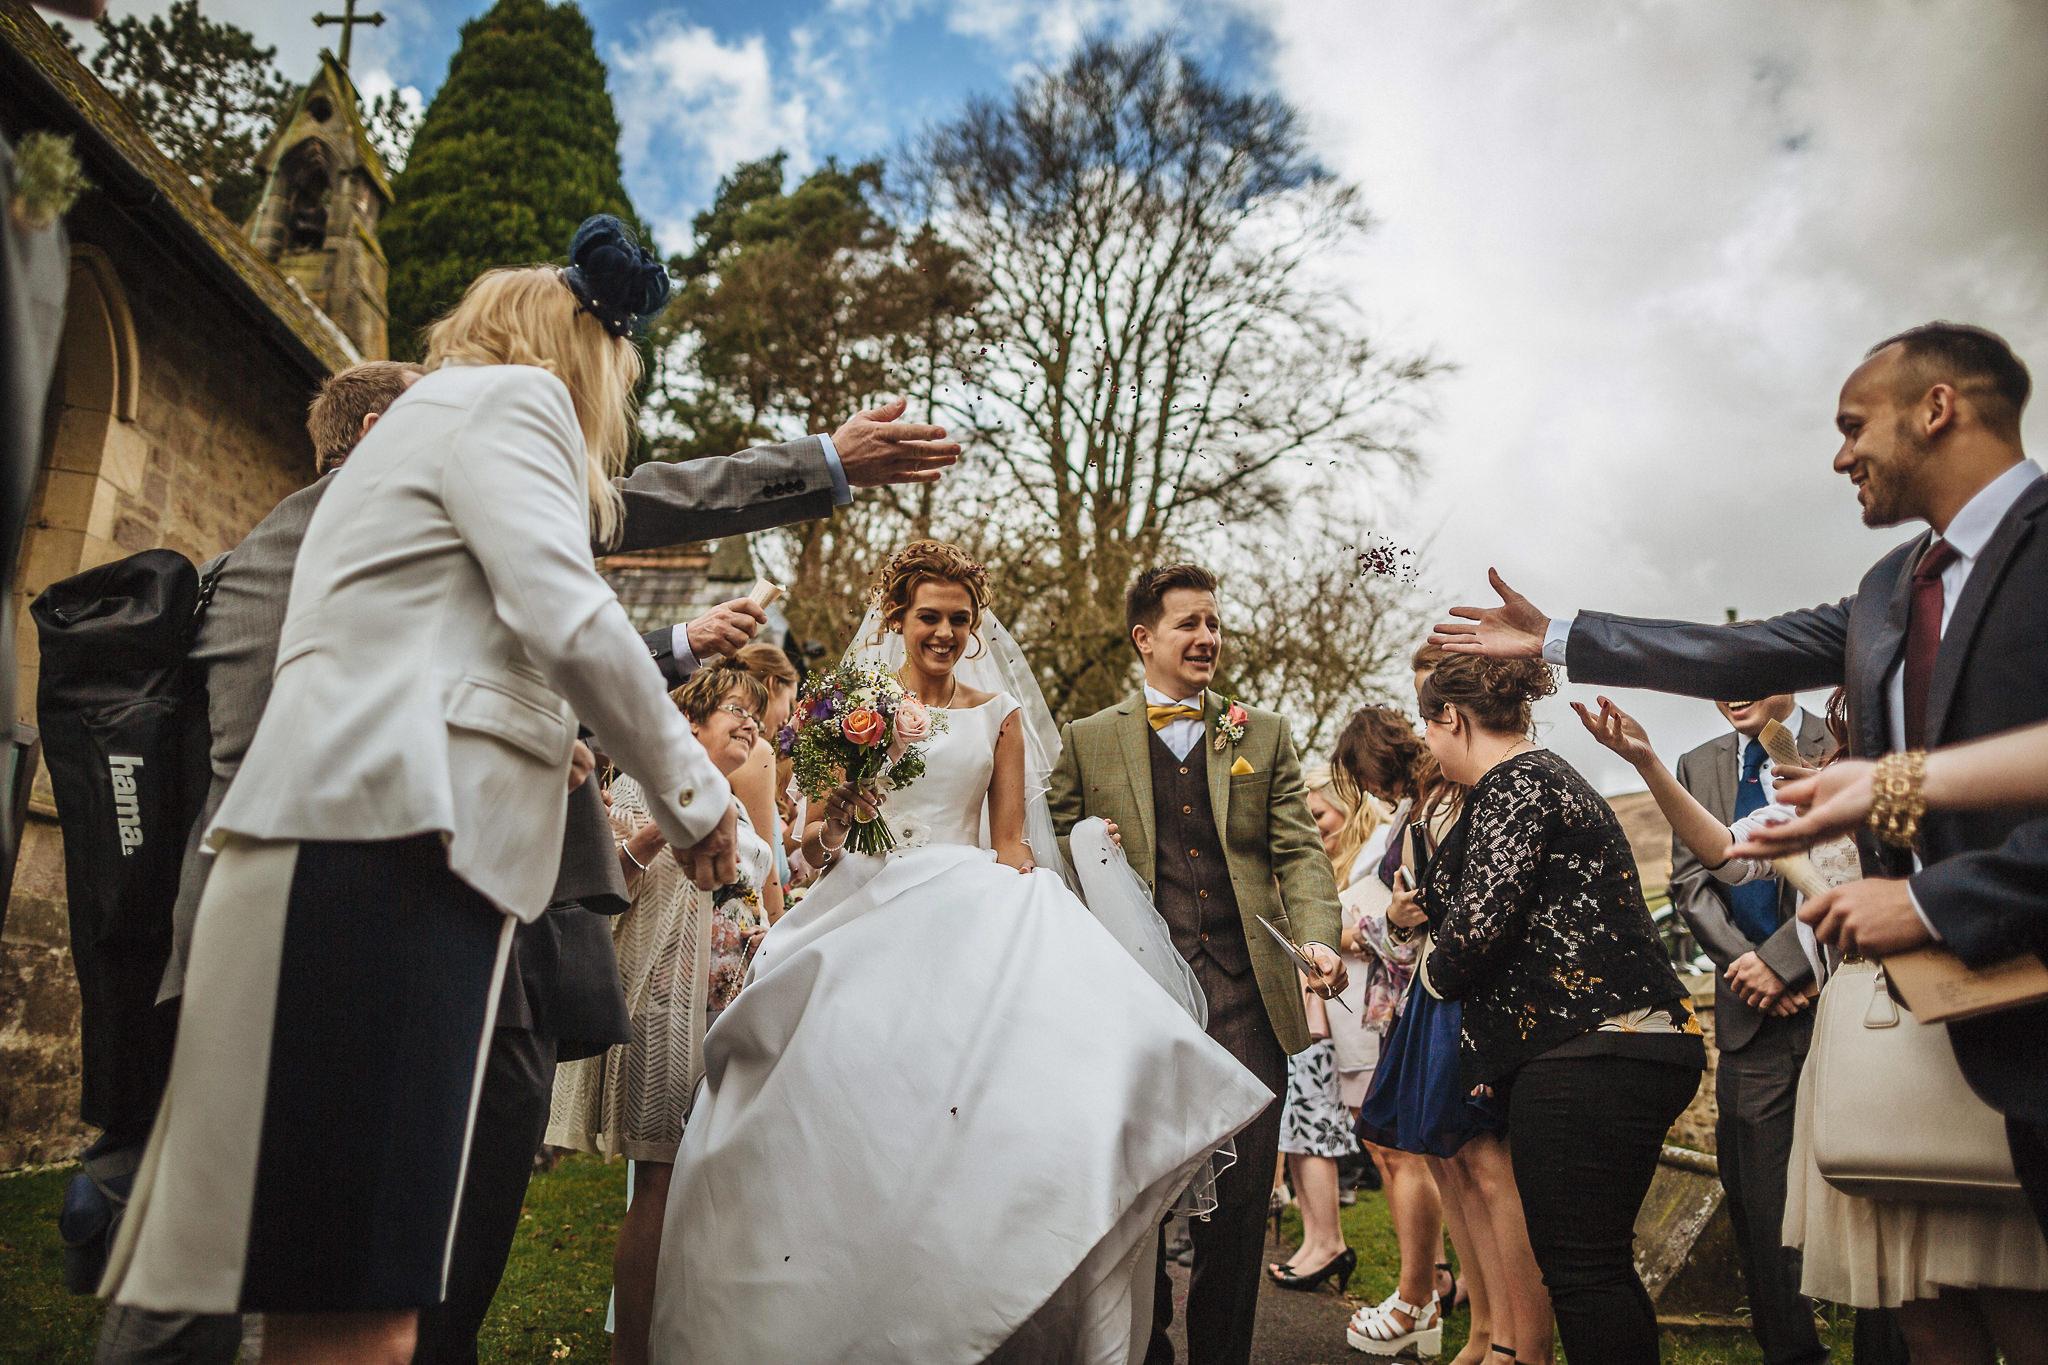 Lancashire-Creative-natural-documentary-wedding-photography-90052